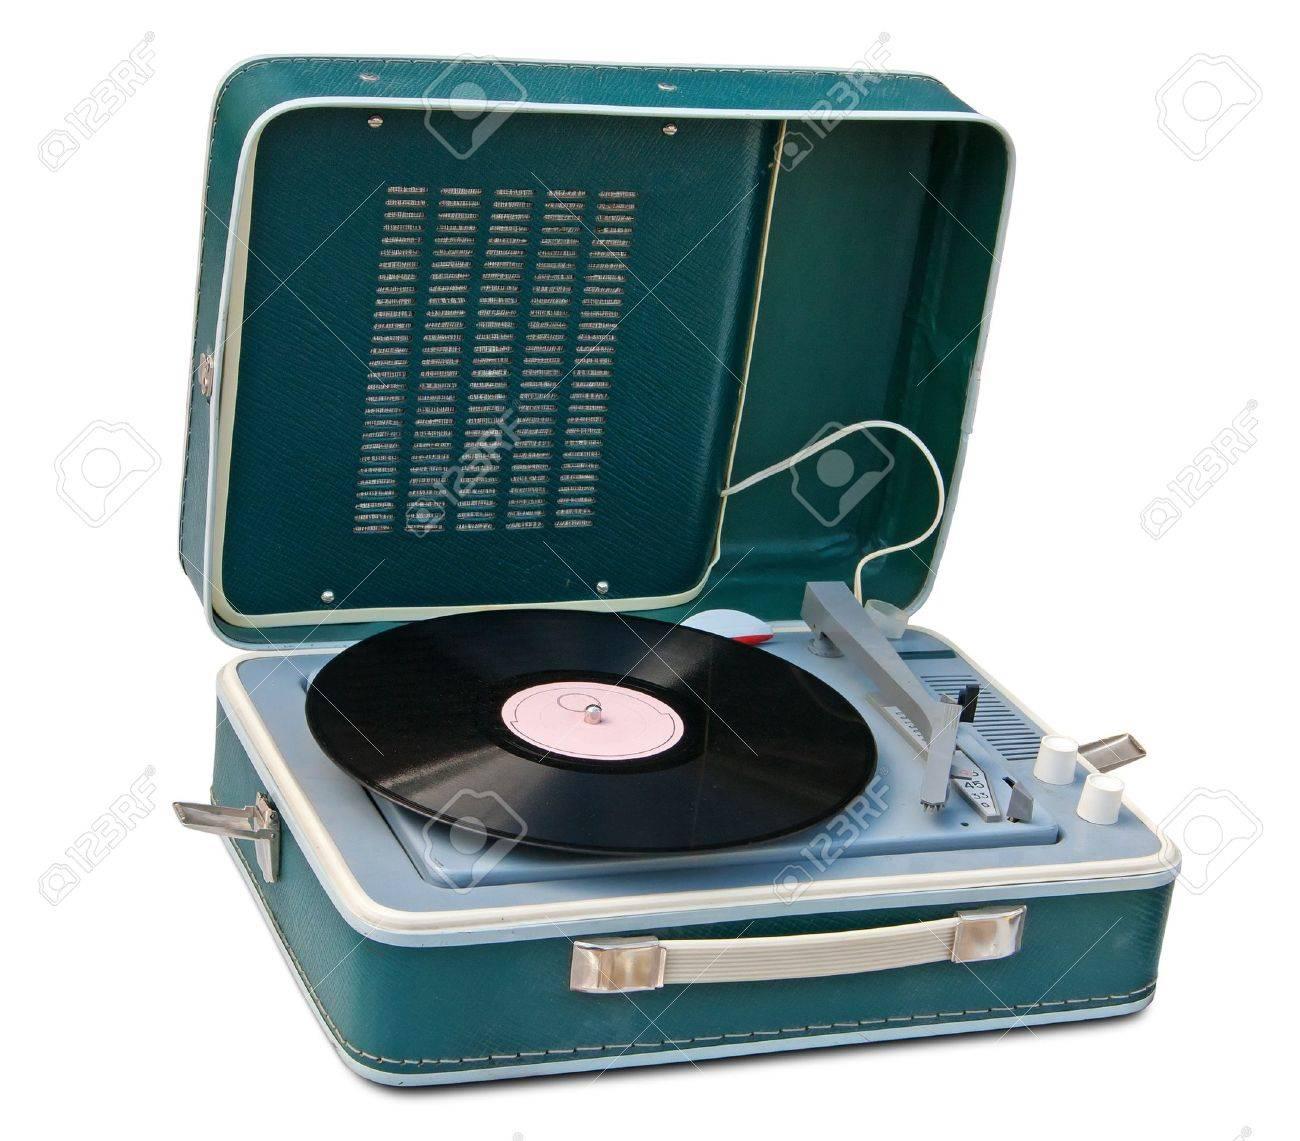 Retro portable turntable isolated. Stock Photo - 10026881